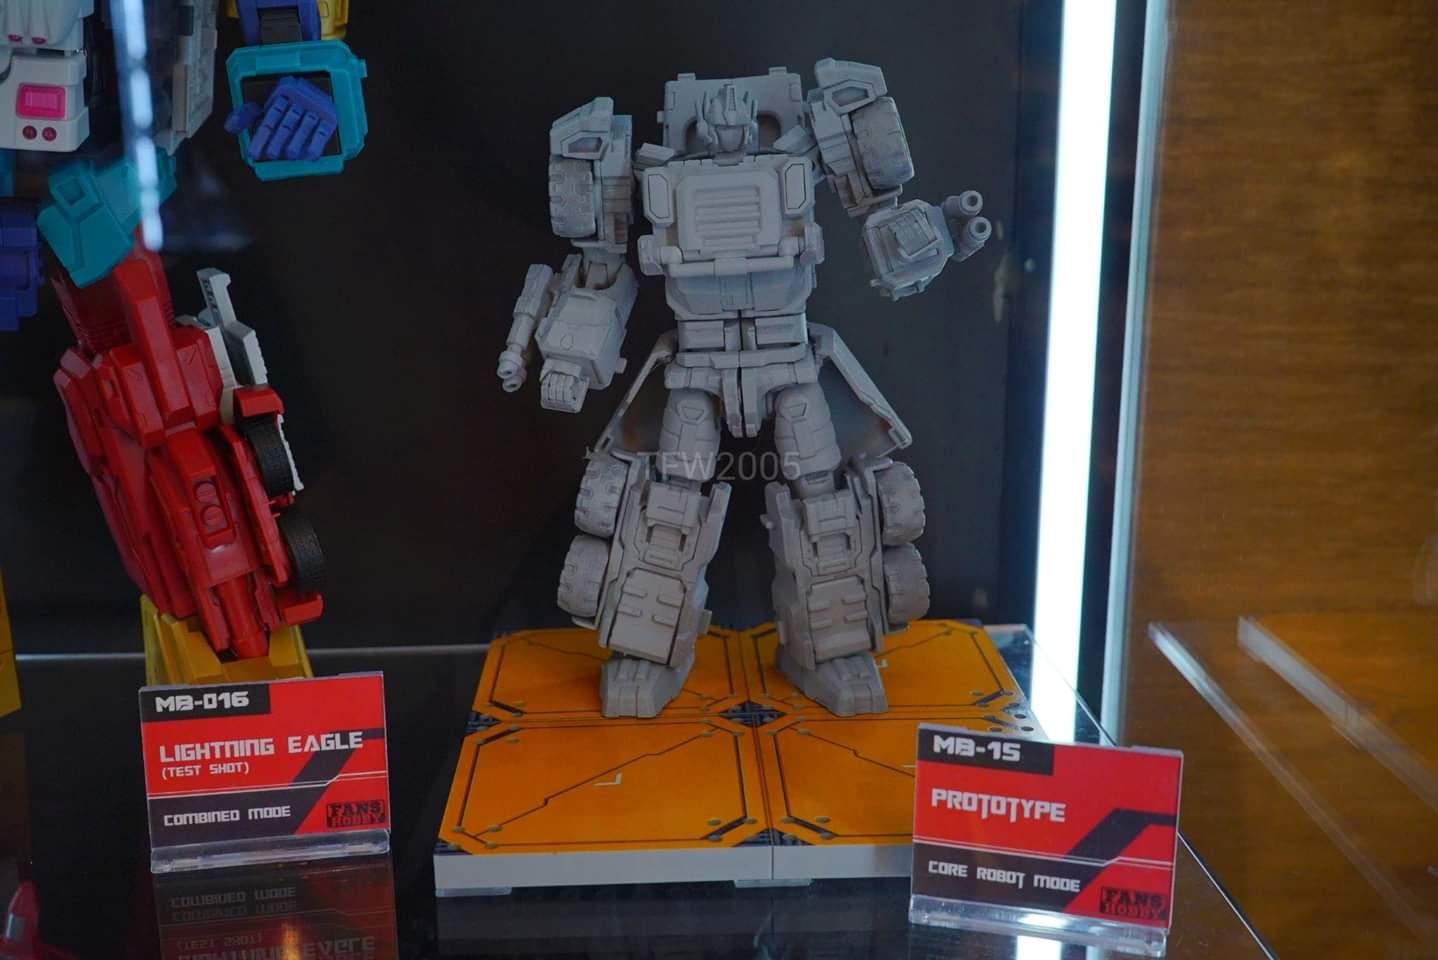 [FansHobby] Produit Tiers - Master Builder MB-15, MB-xx et MB-xx - aka Armada Optimus Prime, Jetfire et Overload MH5B7isT_o